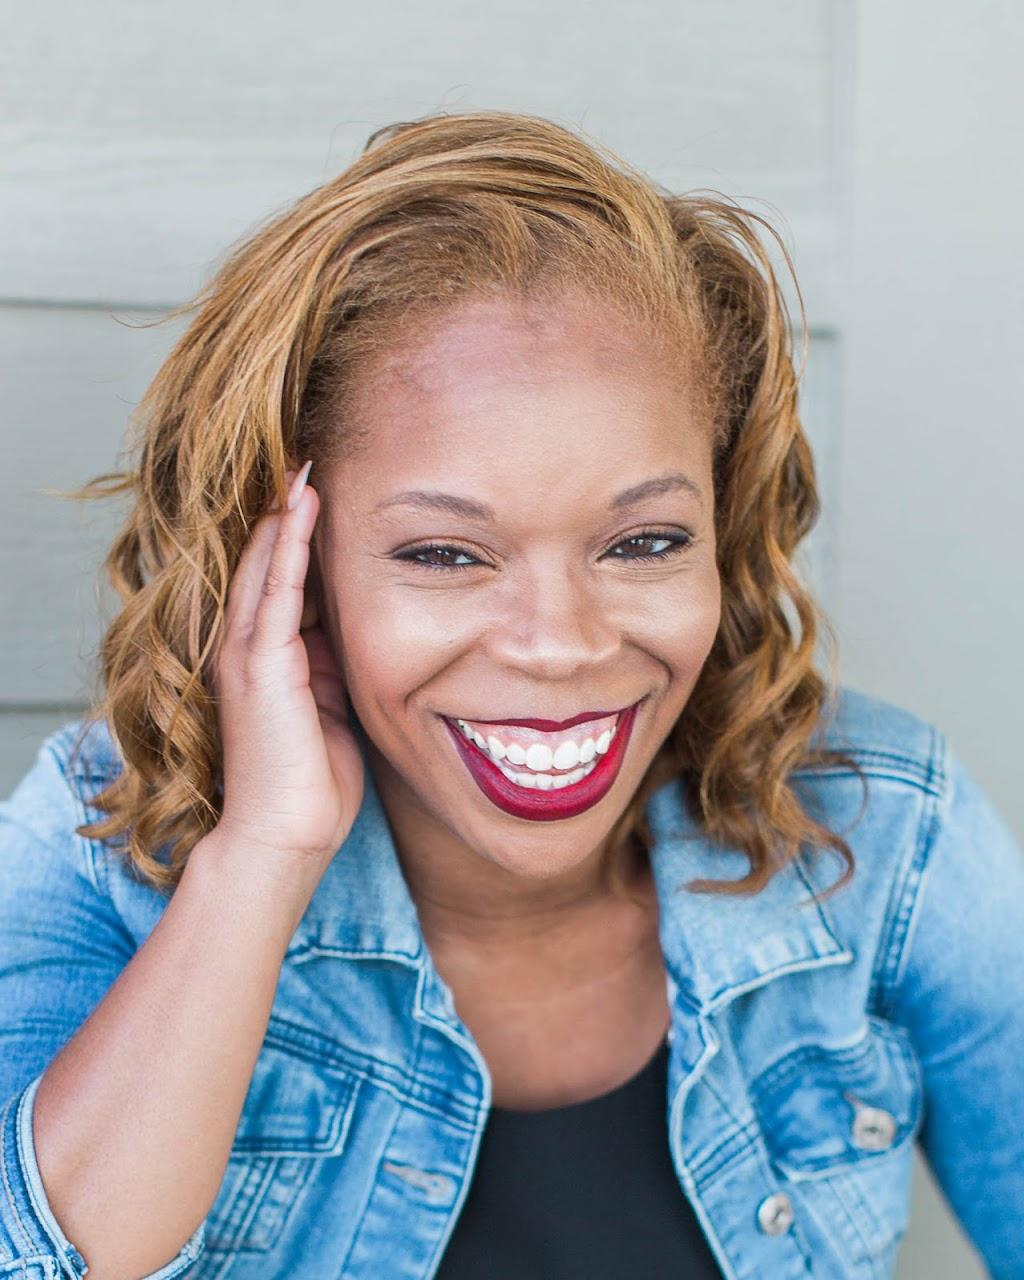 aleia walker, tribe, tribe calls, mentor, creative, creative mentor